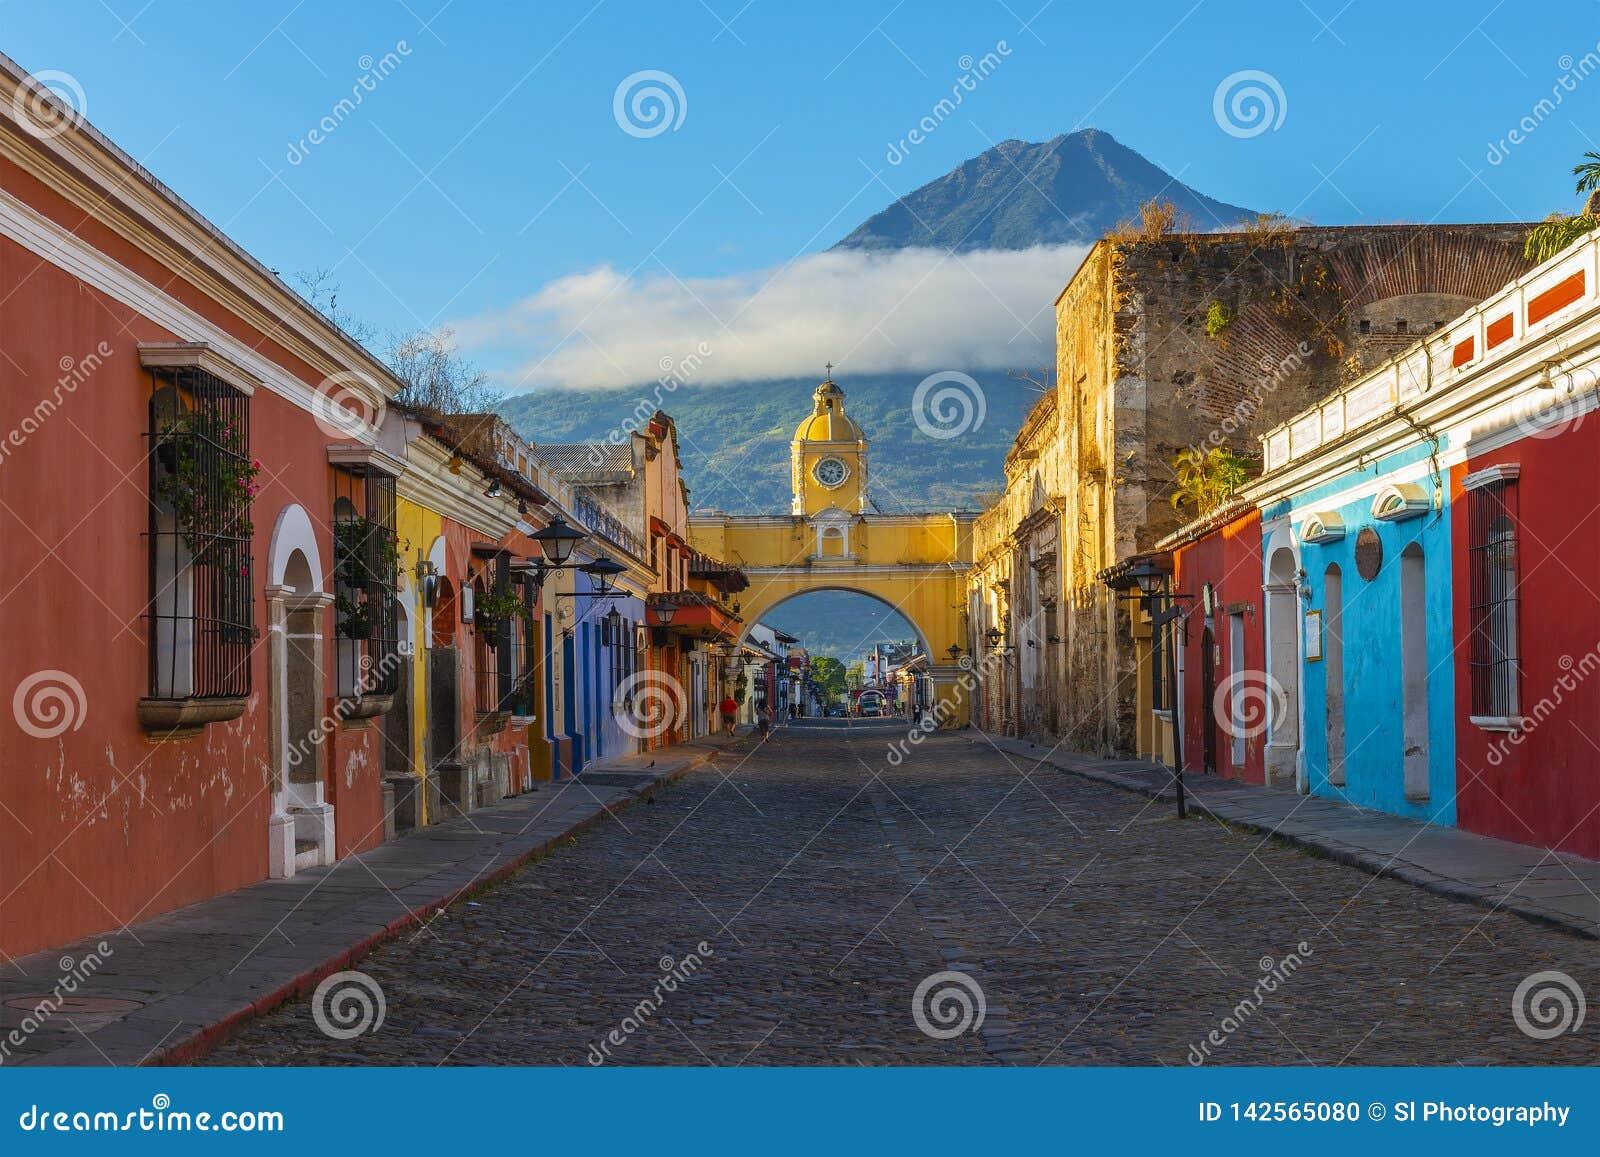 Antigua City at Sunrise with Agua Volcano, Guatemala